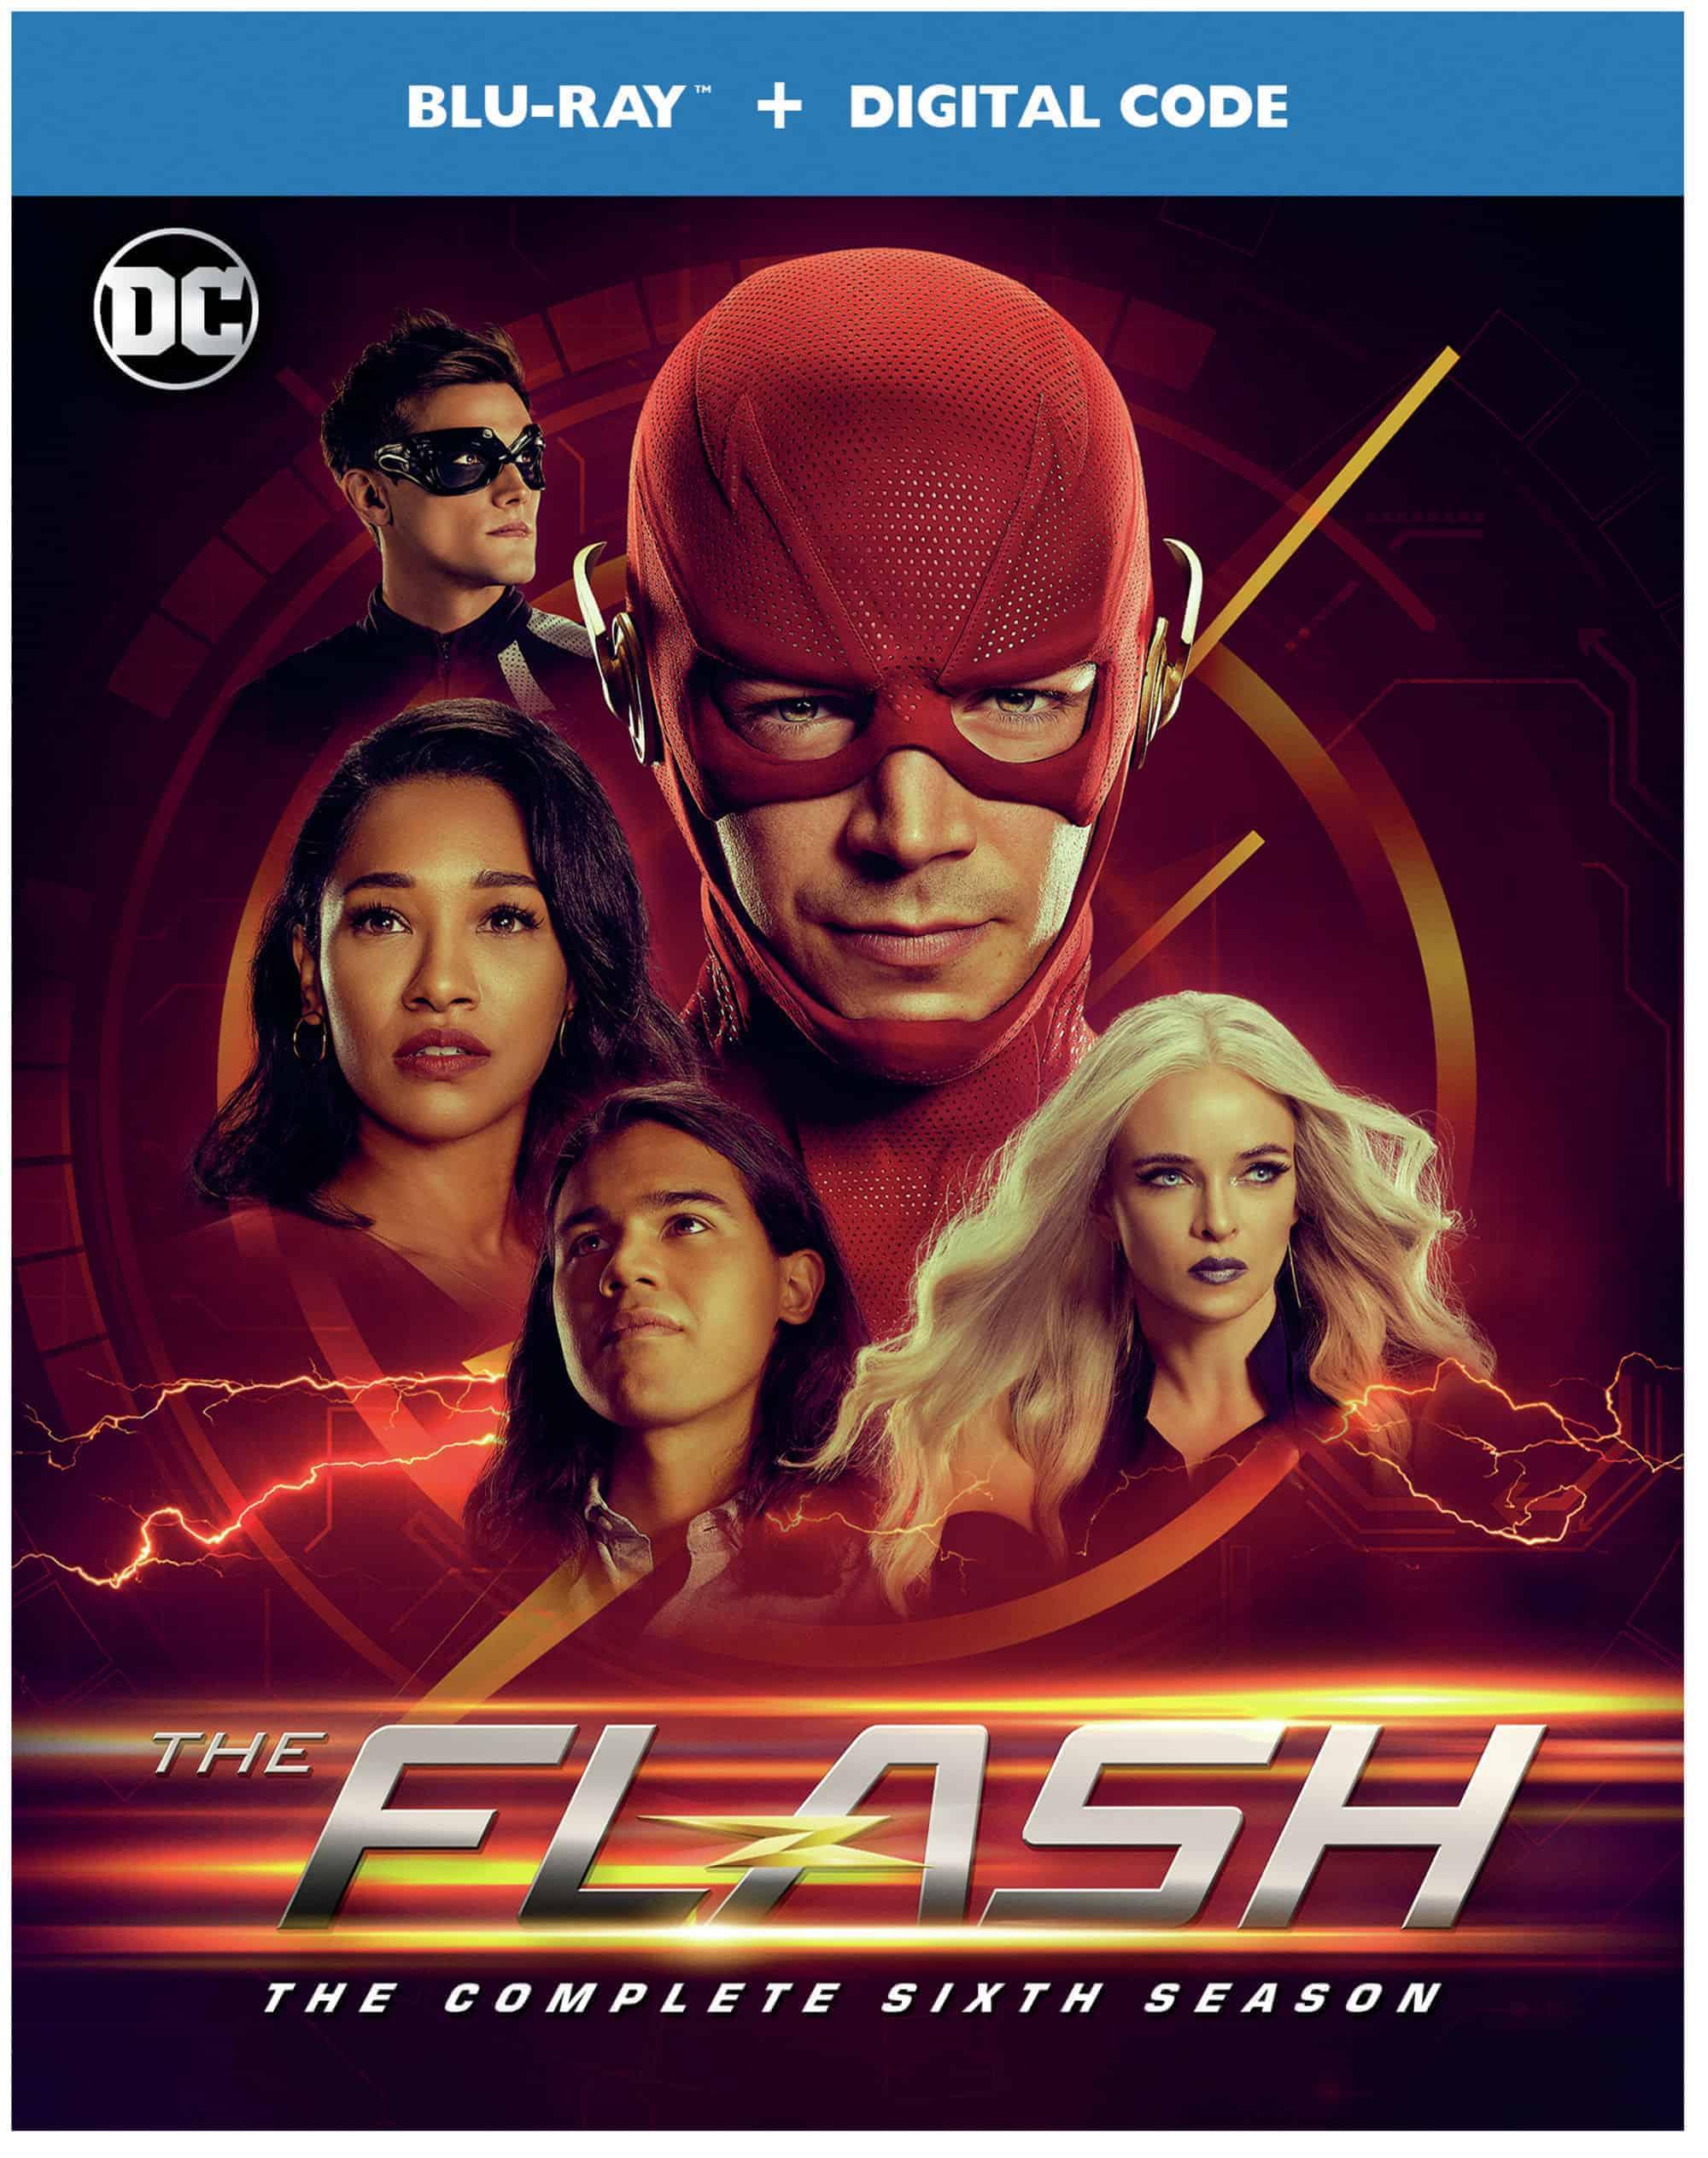 The Flash Season 6 Box art Blu-ray